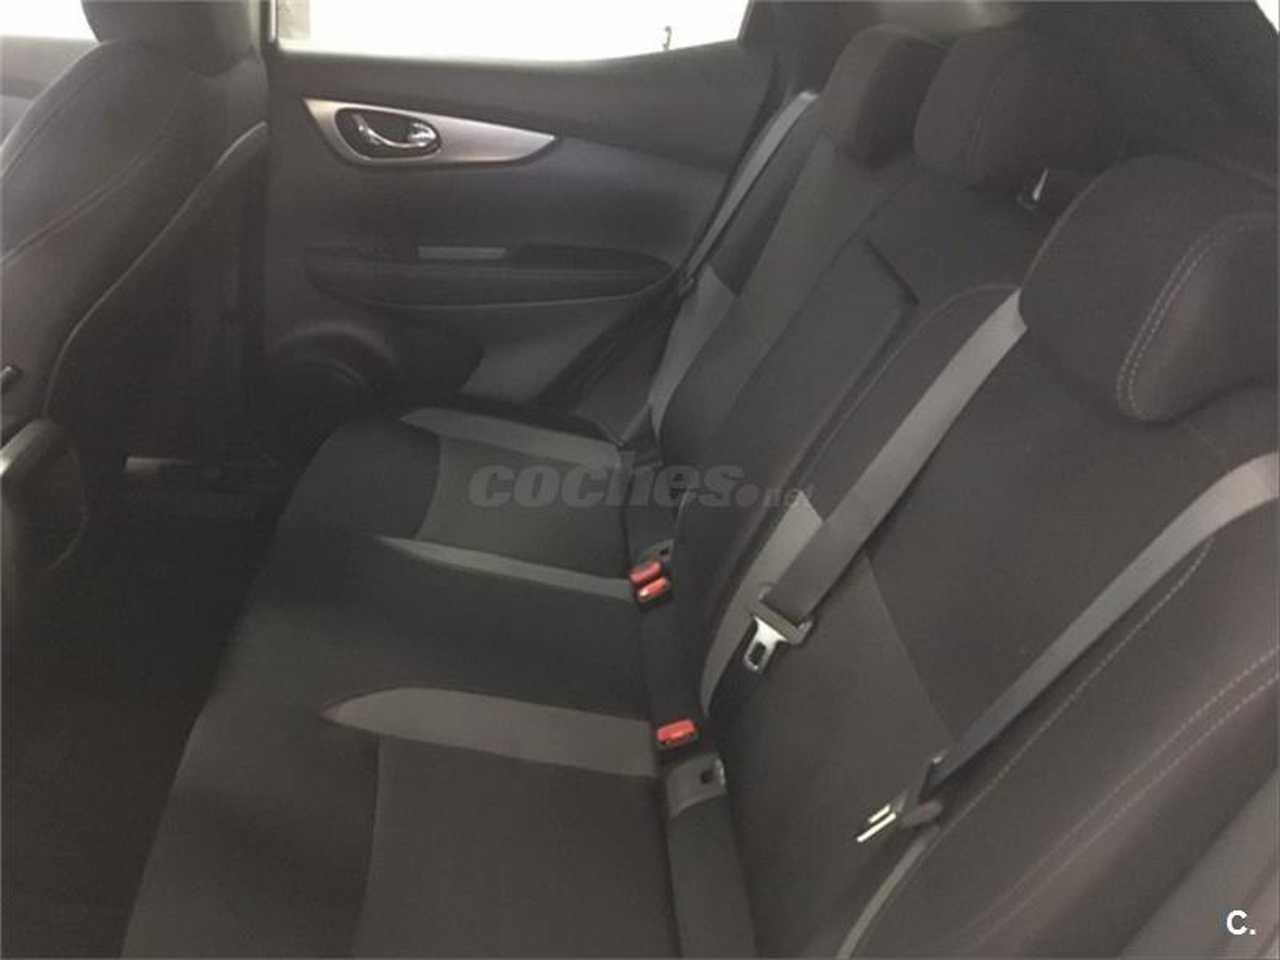 Nissan Qashqai DIGT 85 kW 115 CV NCONNECTA 5p full